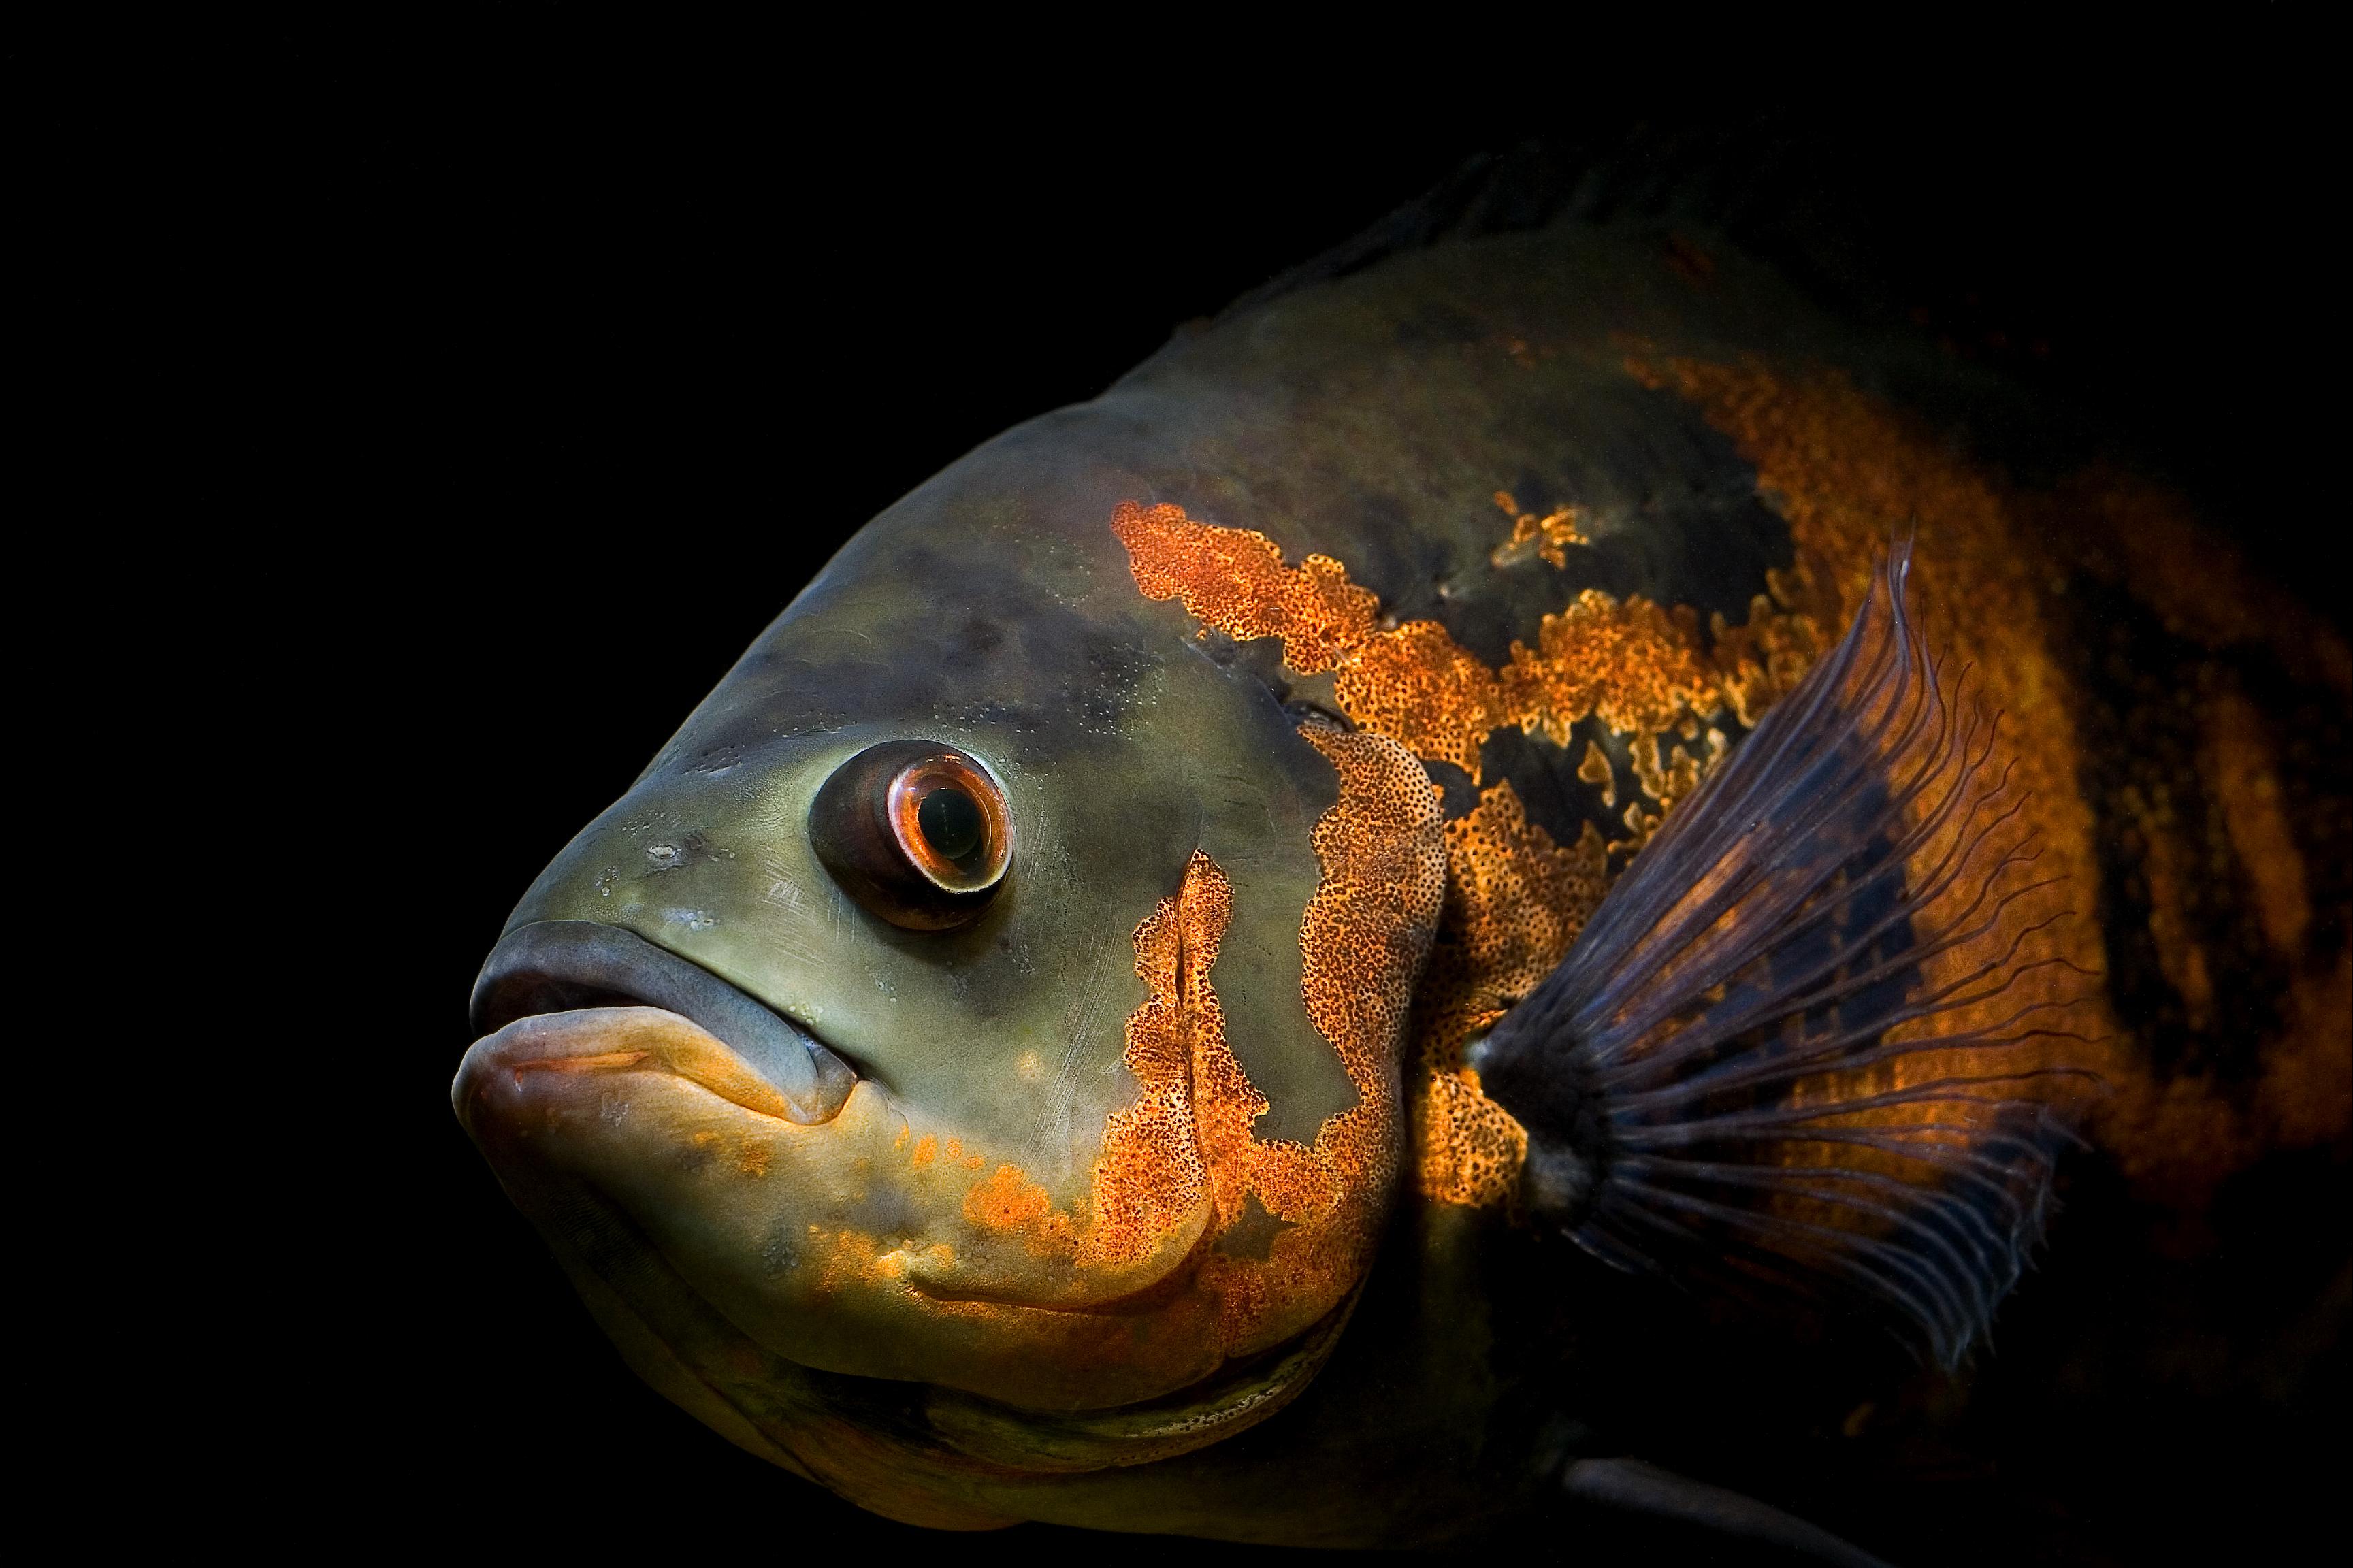 Flowerhorn care and maintenance oscar fish care and tips nvjuhfo Gallery